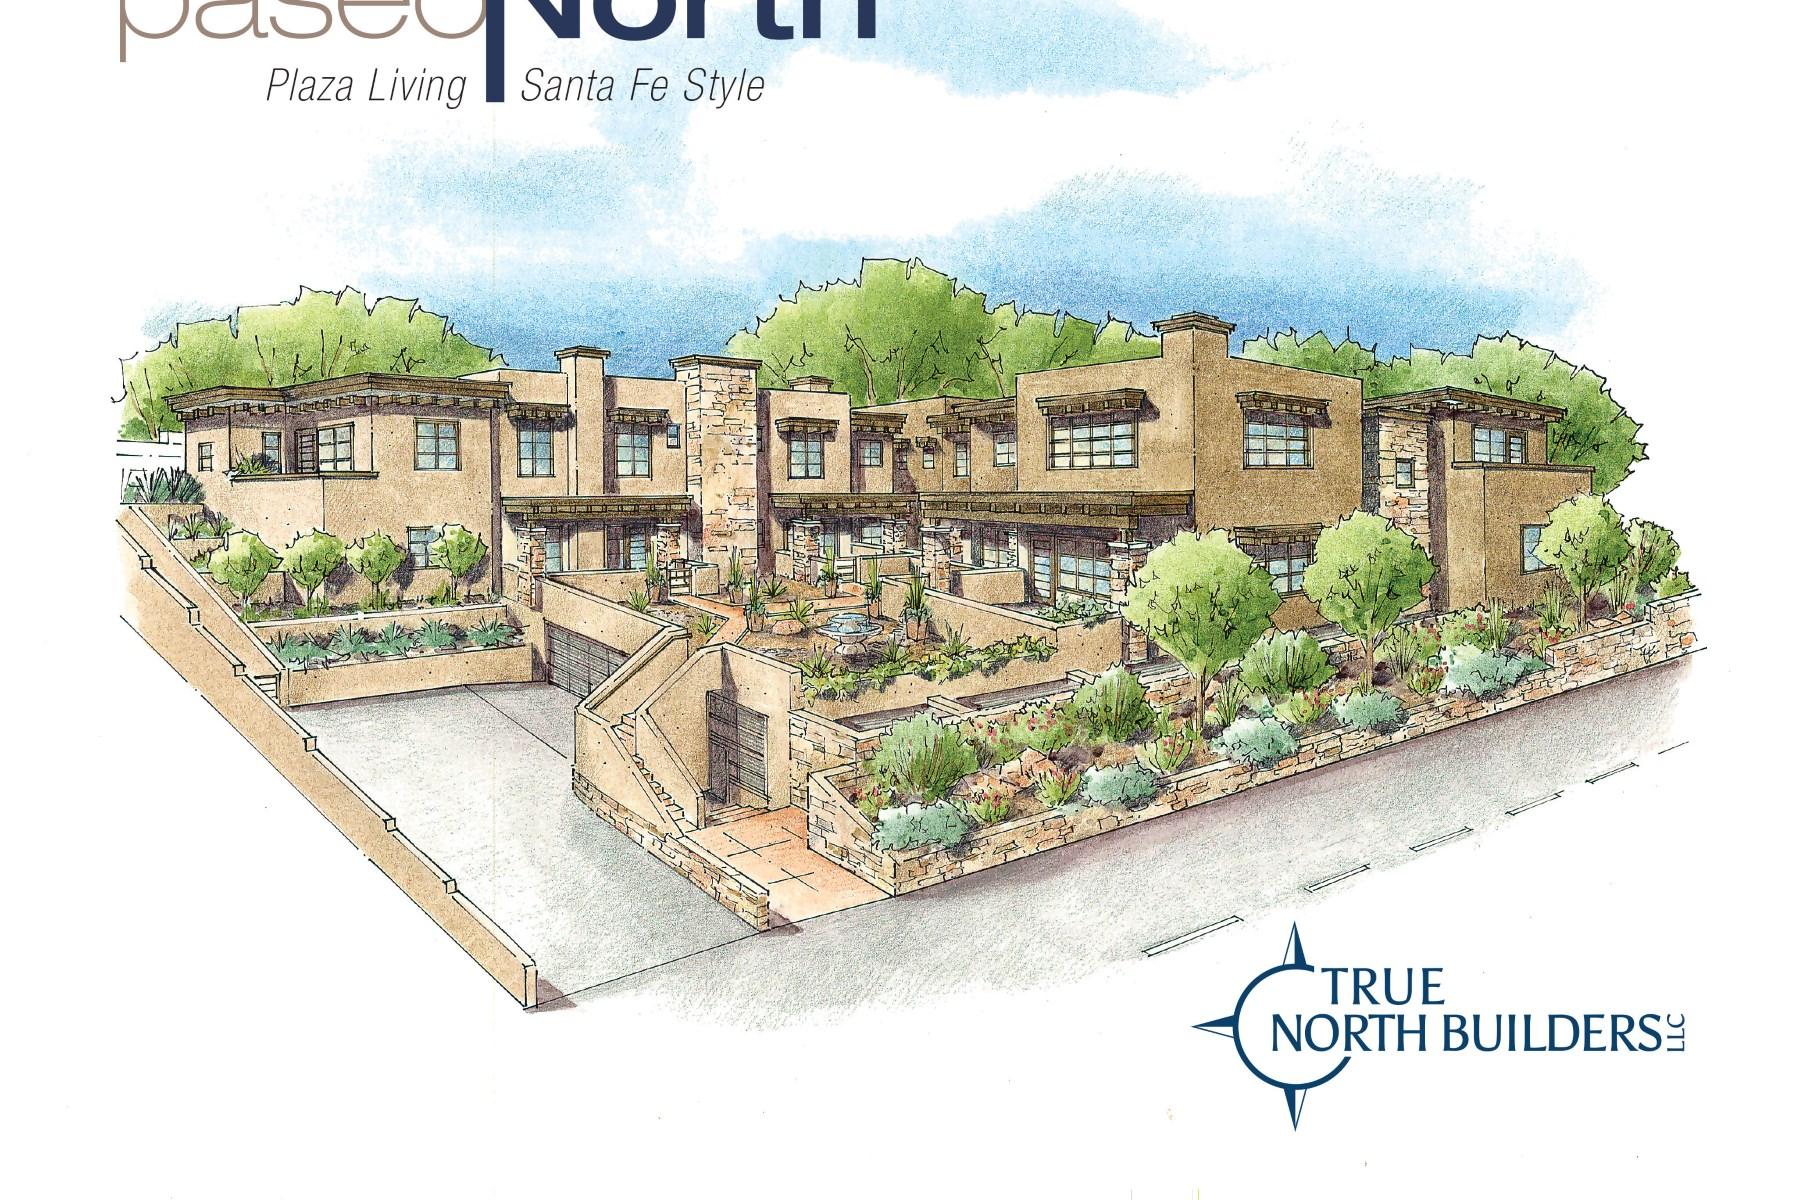 Condominium for Sale at 511 Paseo De Peralta #1 Santa Fe City Northeast, Santa Fe, New Mexico 87501 United States